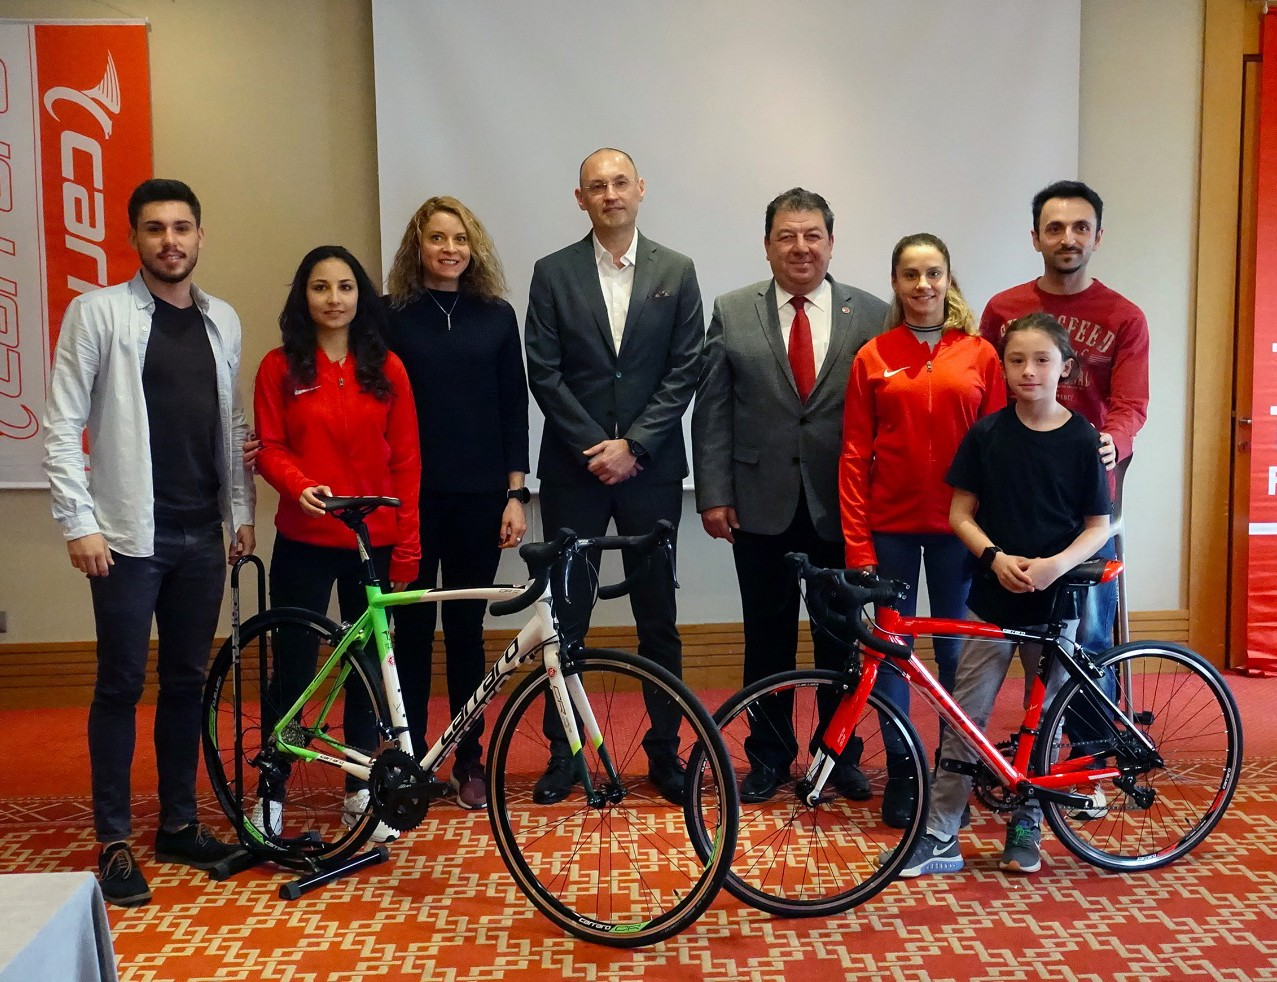 Accell Bisiklet Triatlon Sponsorluğuna Devam Edecek